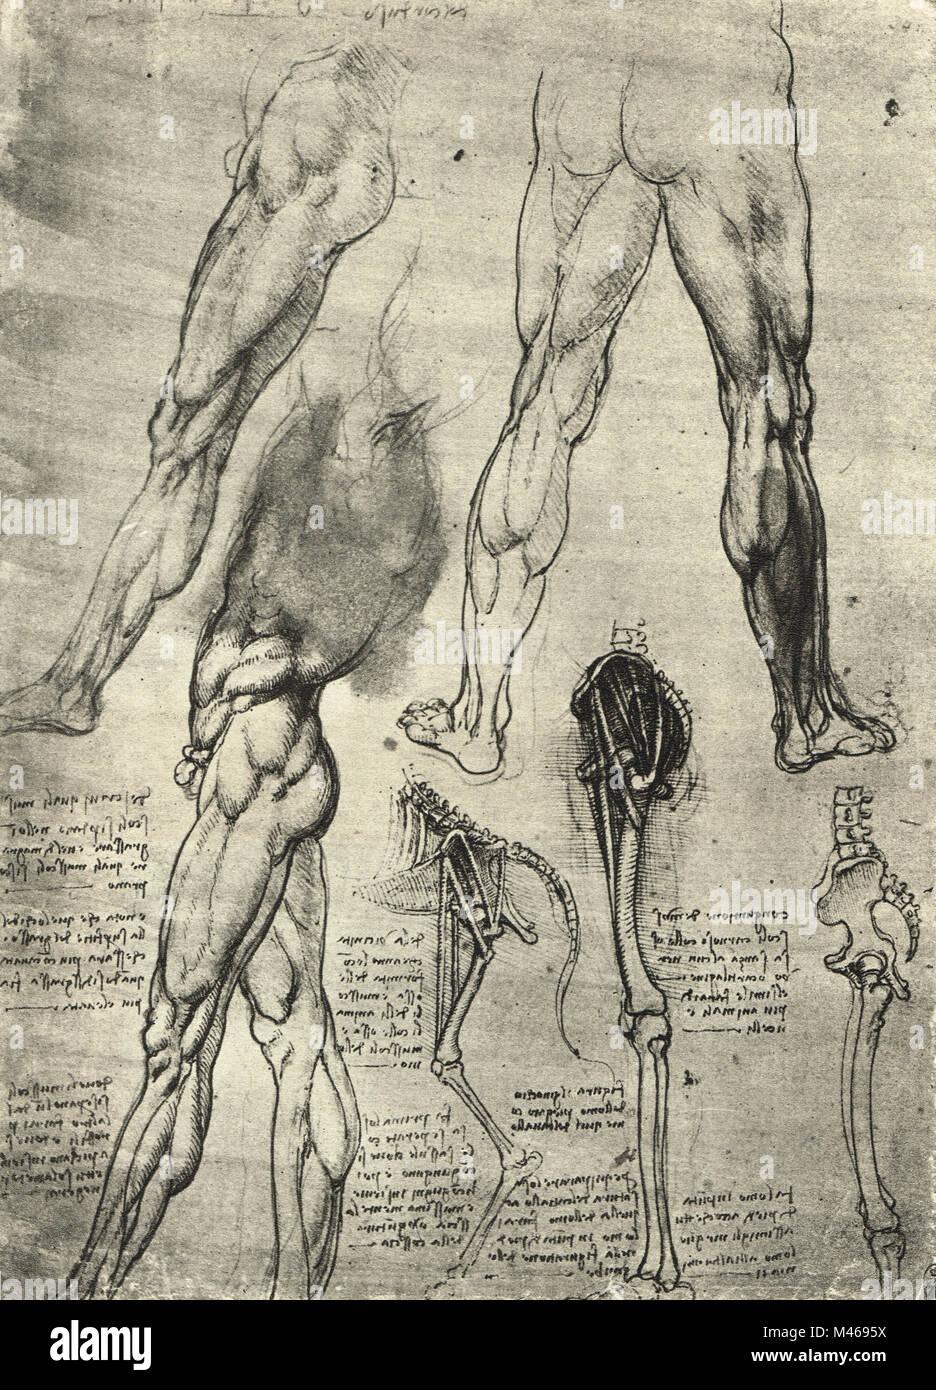 Man anatomy drawing